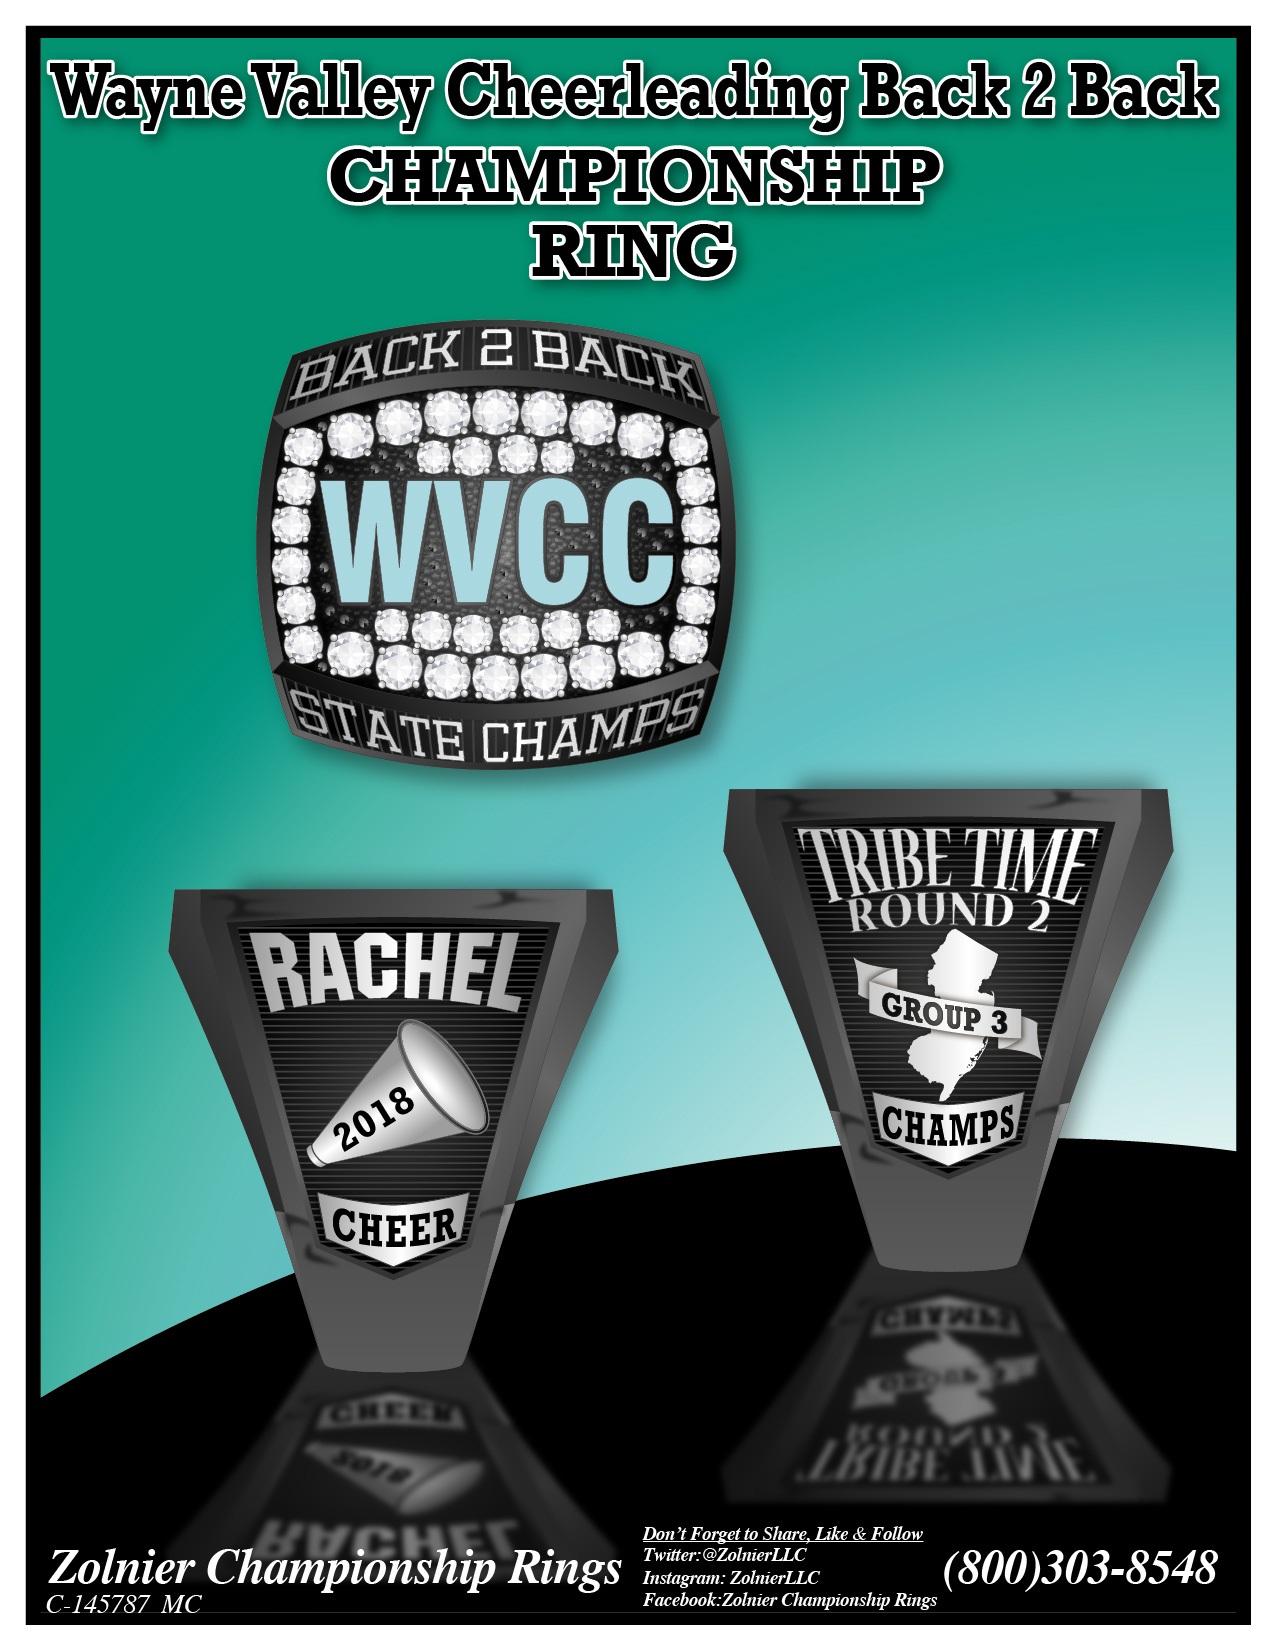 C-145787 Wayne Valley Cheerleading Champ Ring